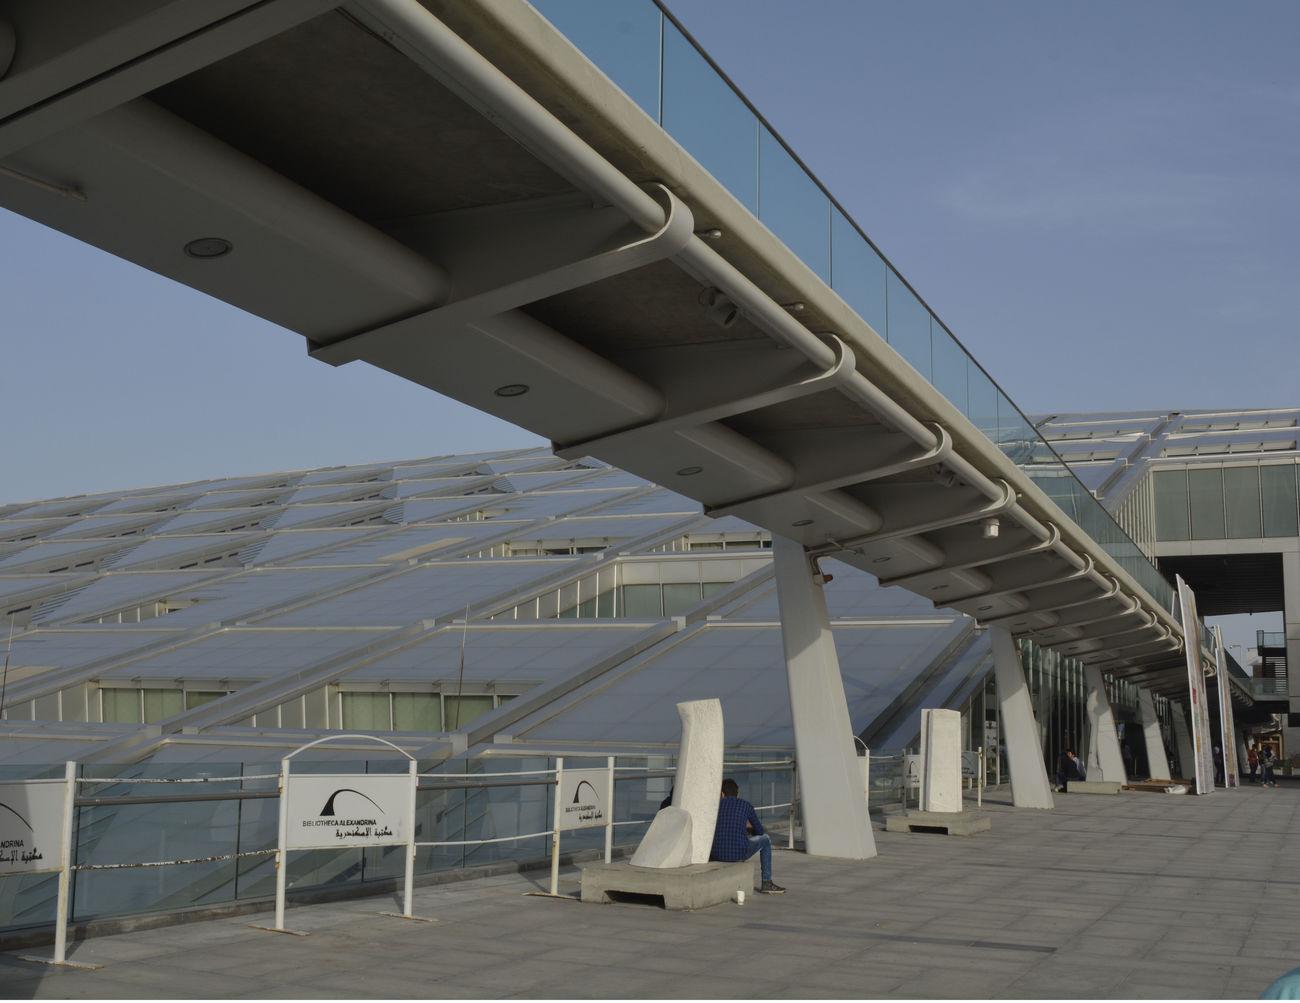 Architecture Bridge Built Structure Day Outdoors Sky